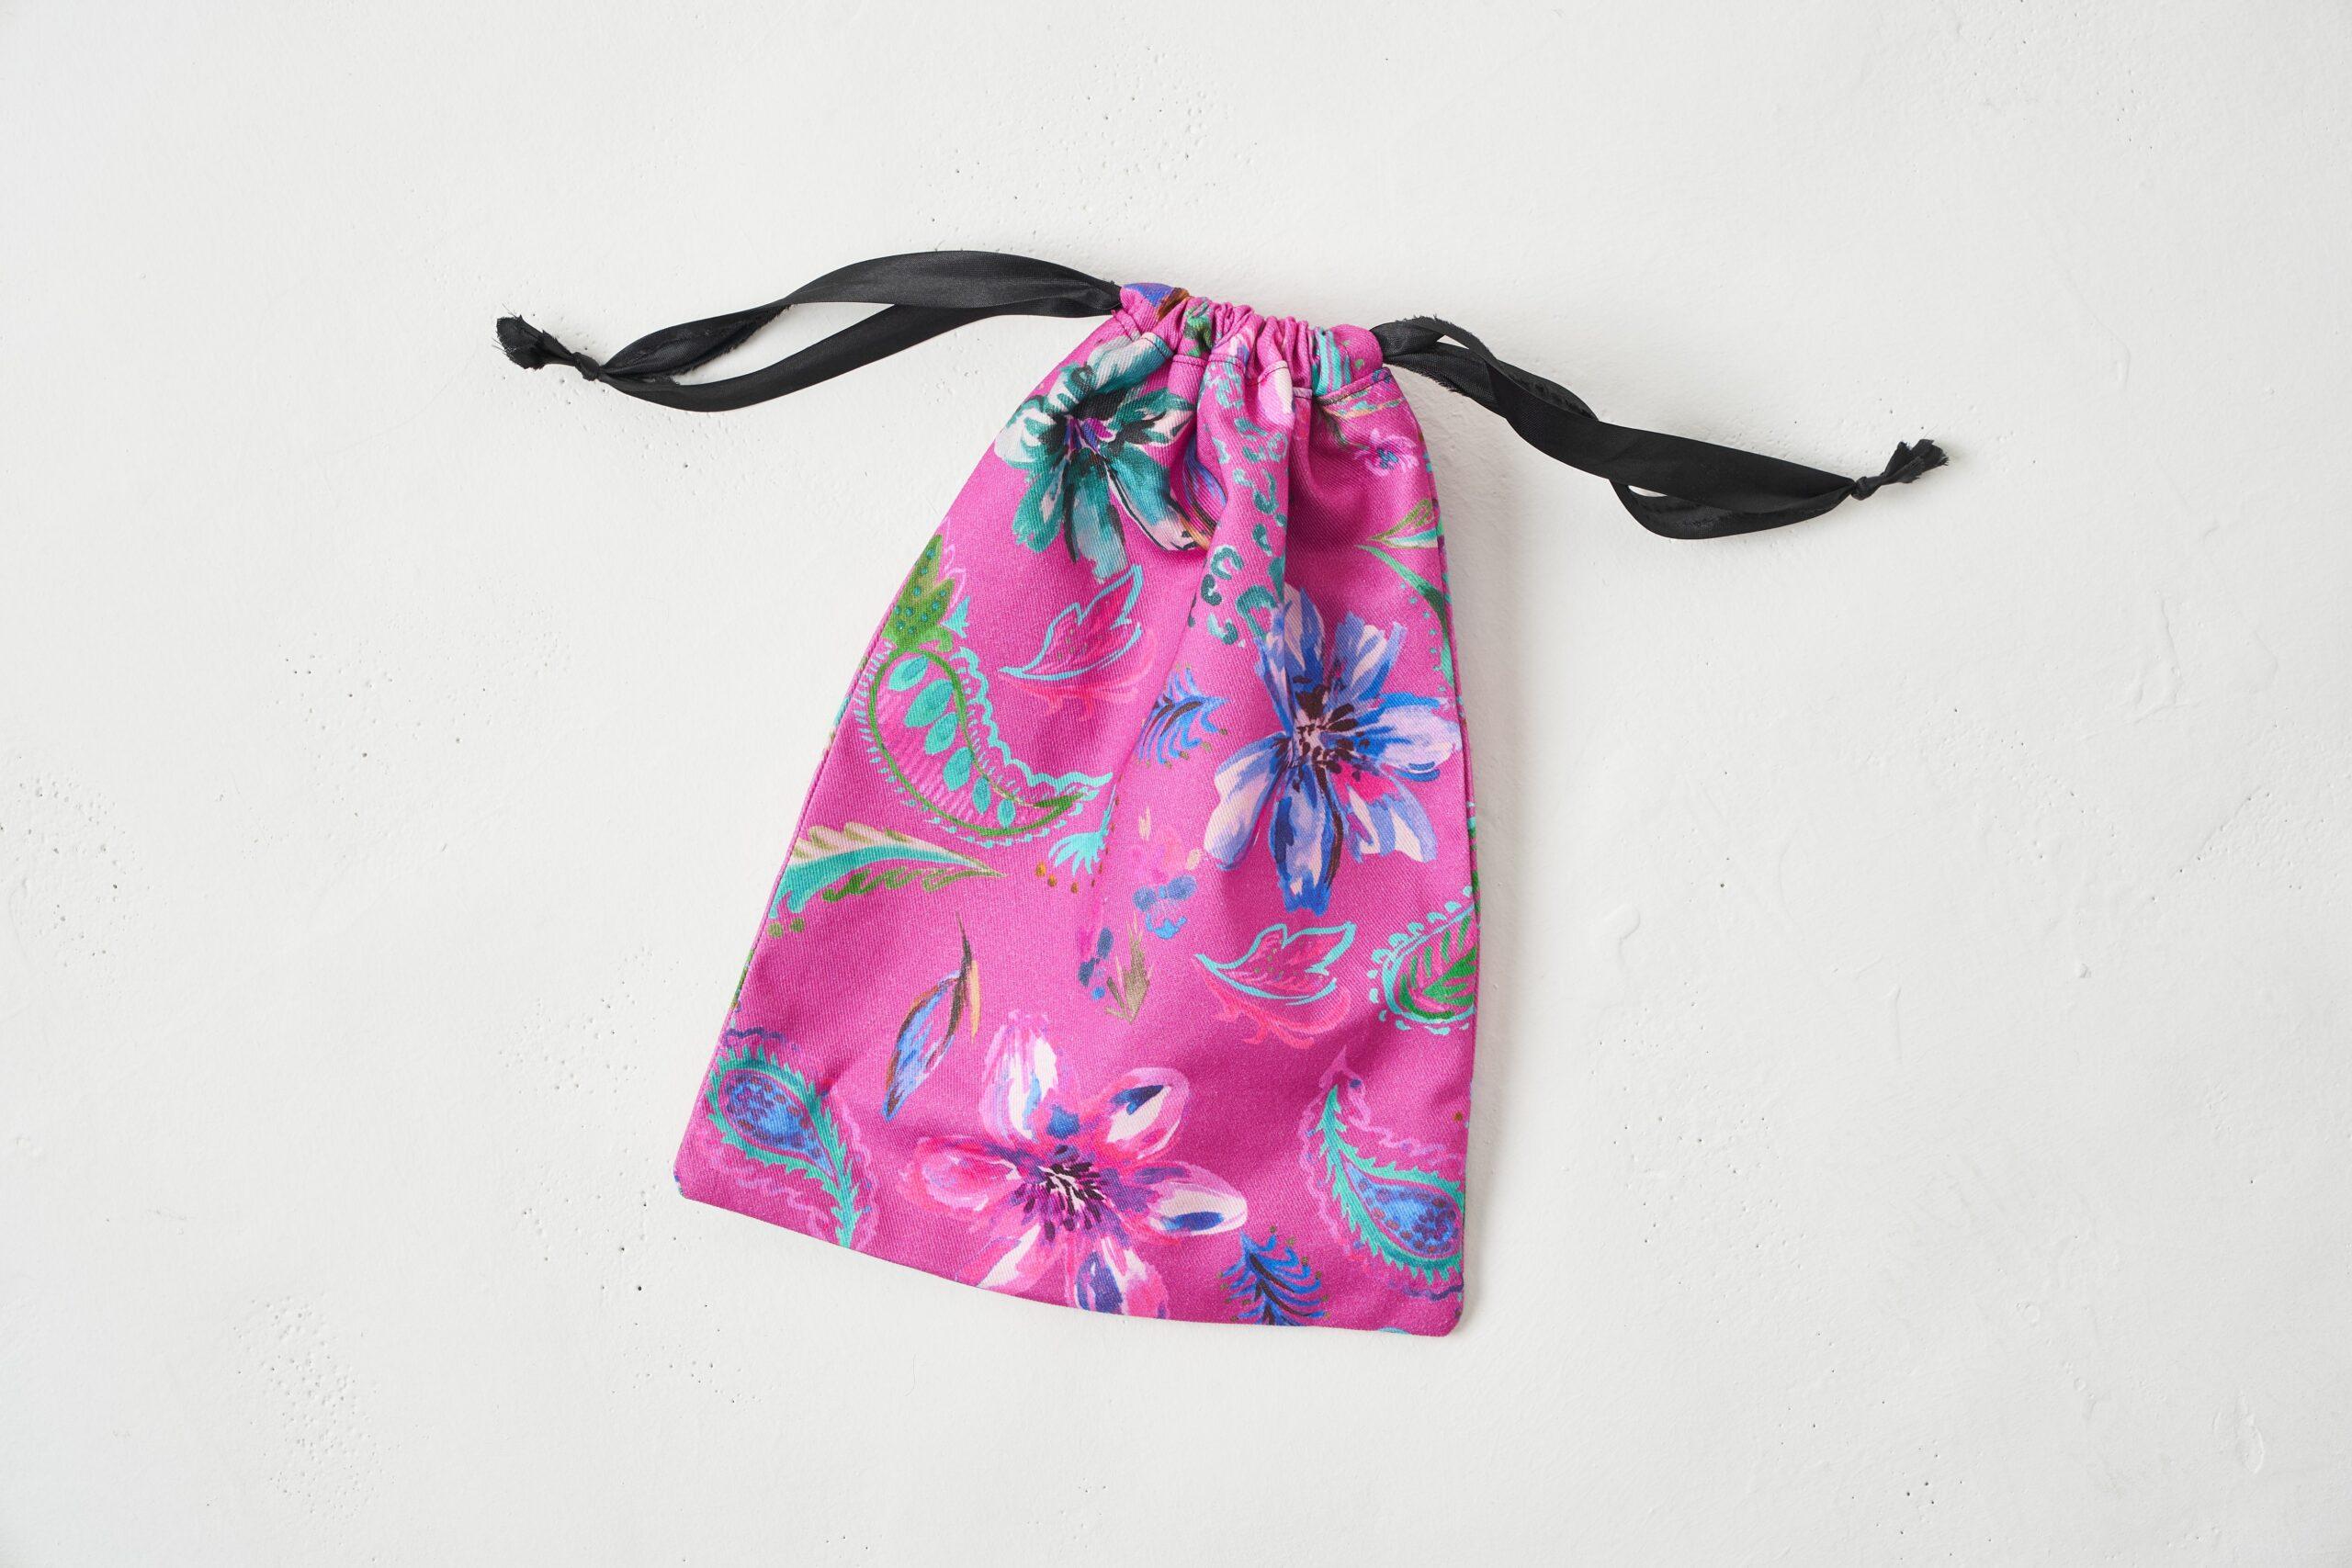 Sew Over It - Drawstring Bag